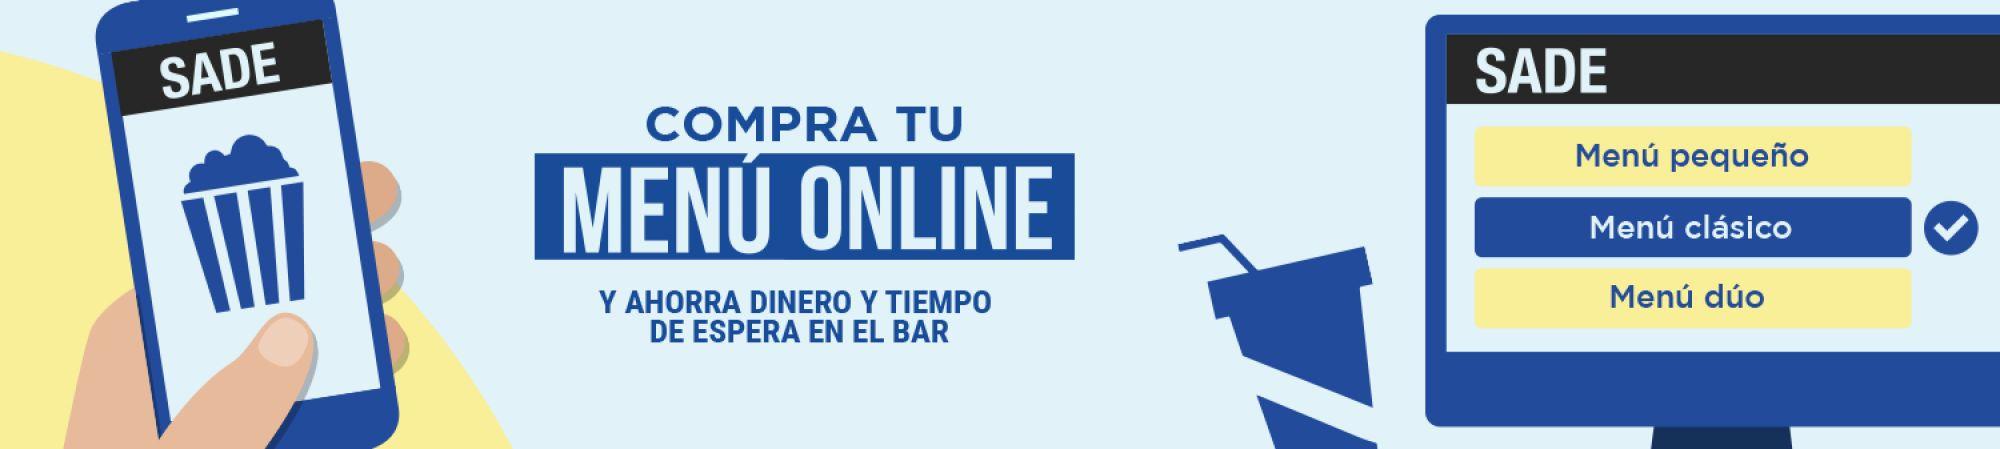 Banner_menu Online_1500x337 (1).Png